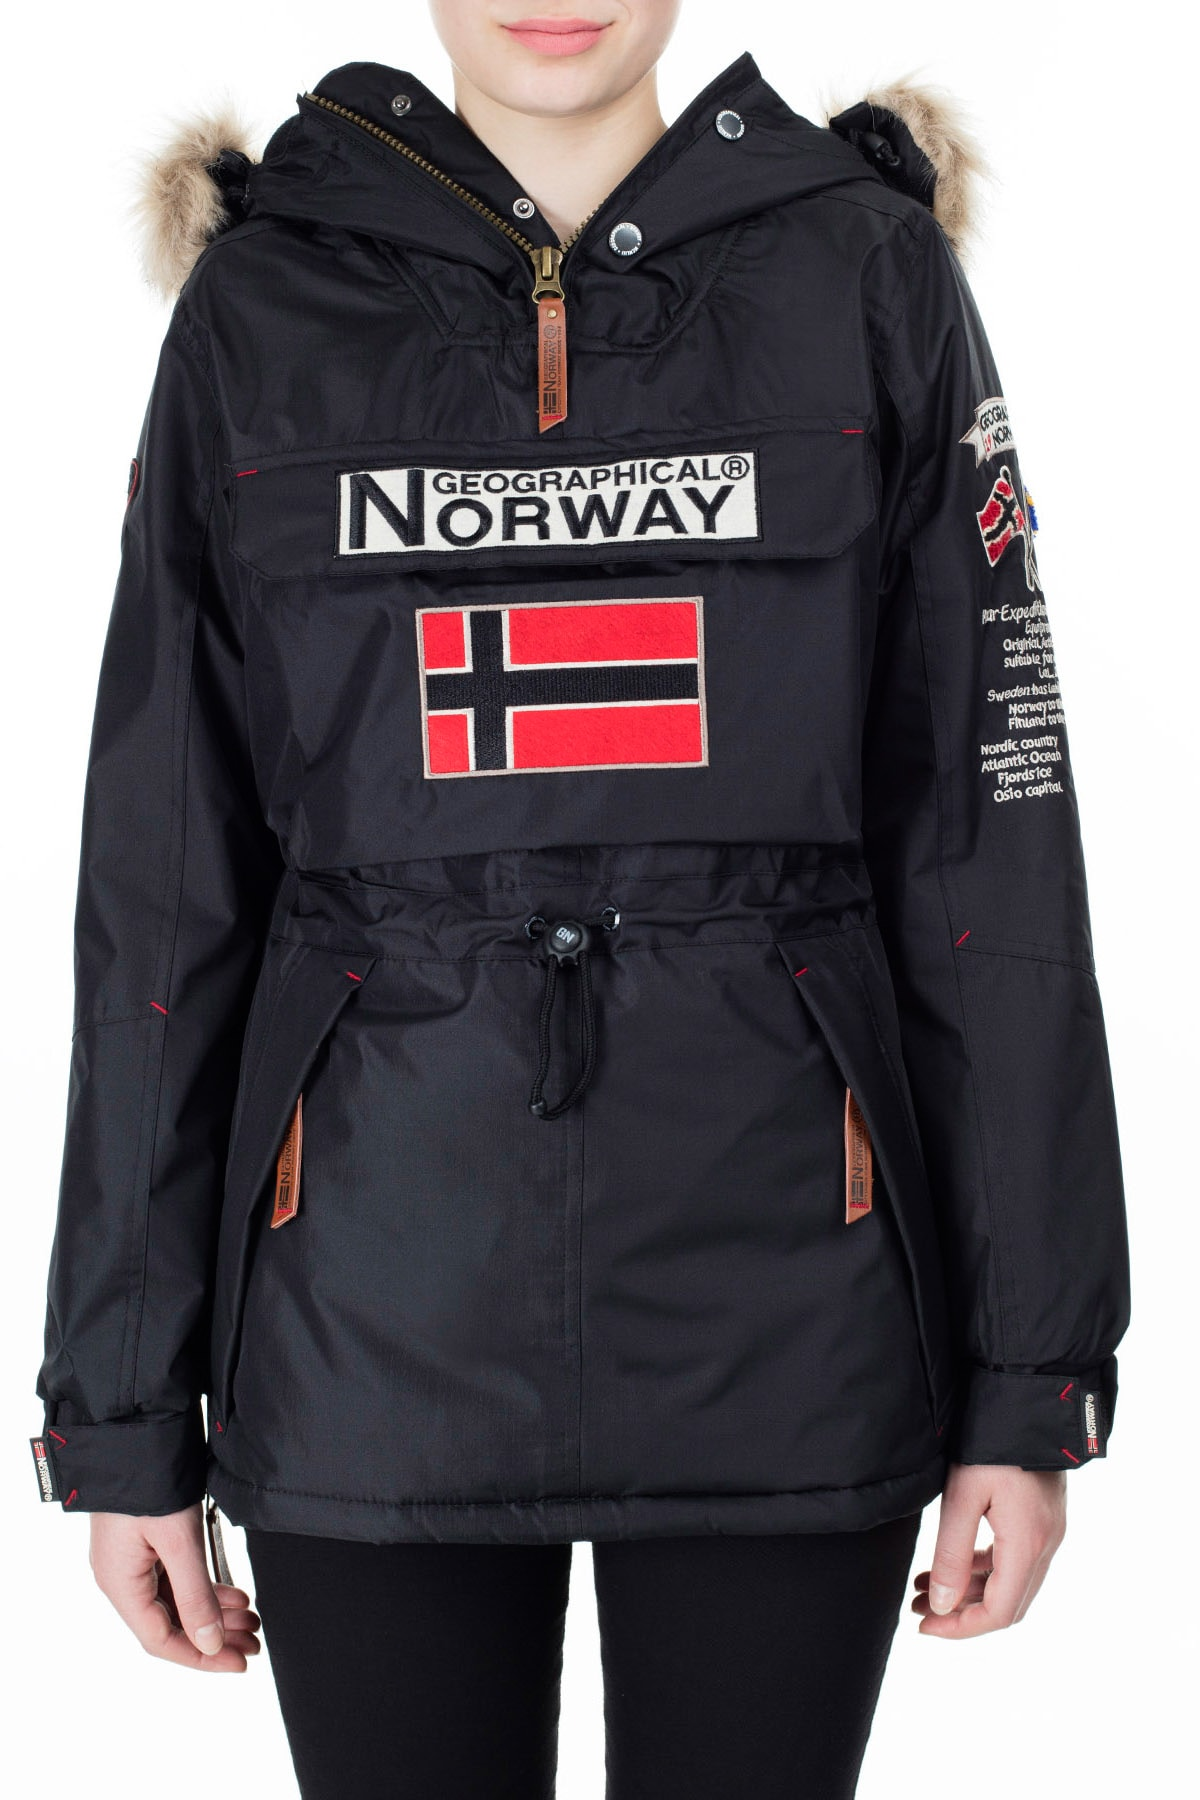 Norway Geographical Kadın Siyah Parka BOOMERA 2